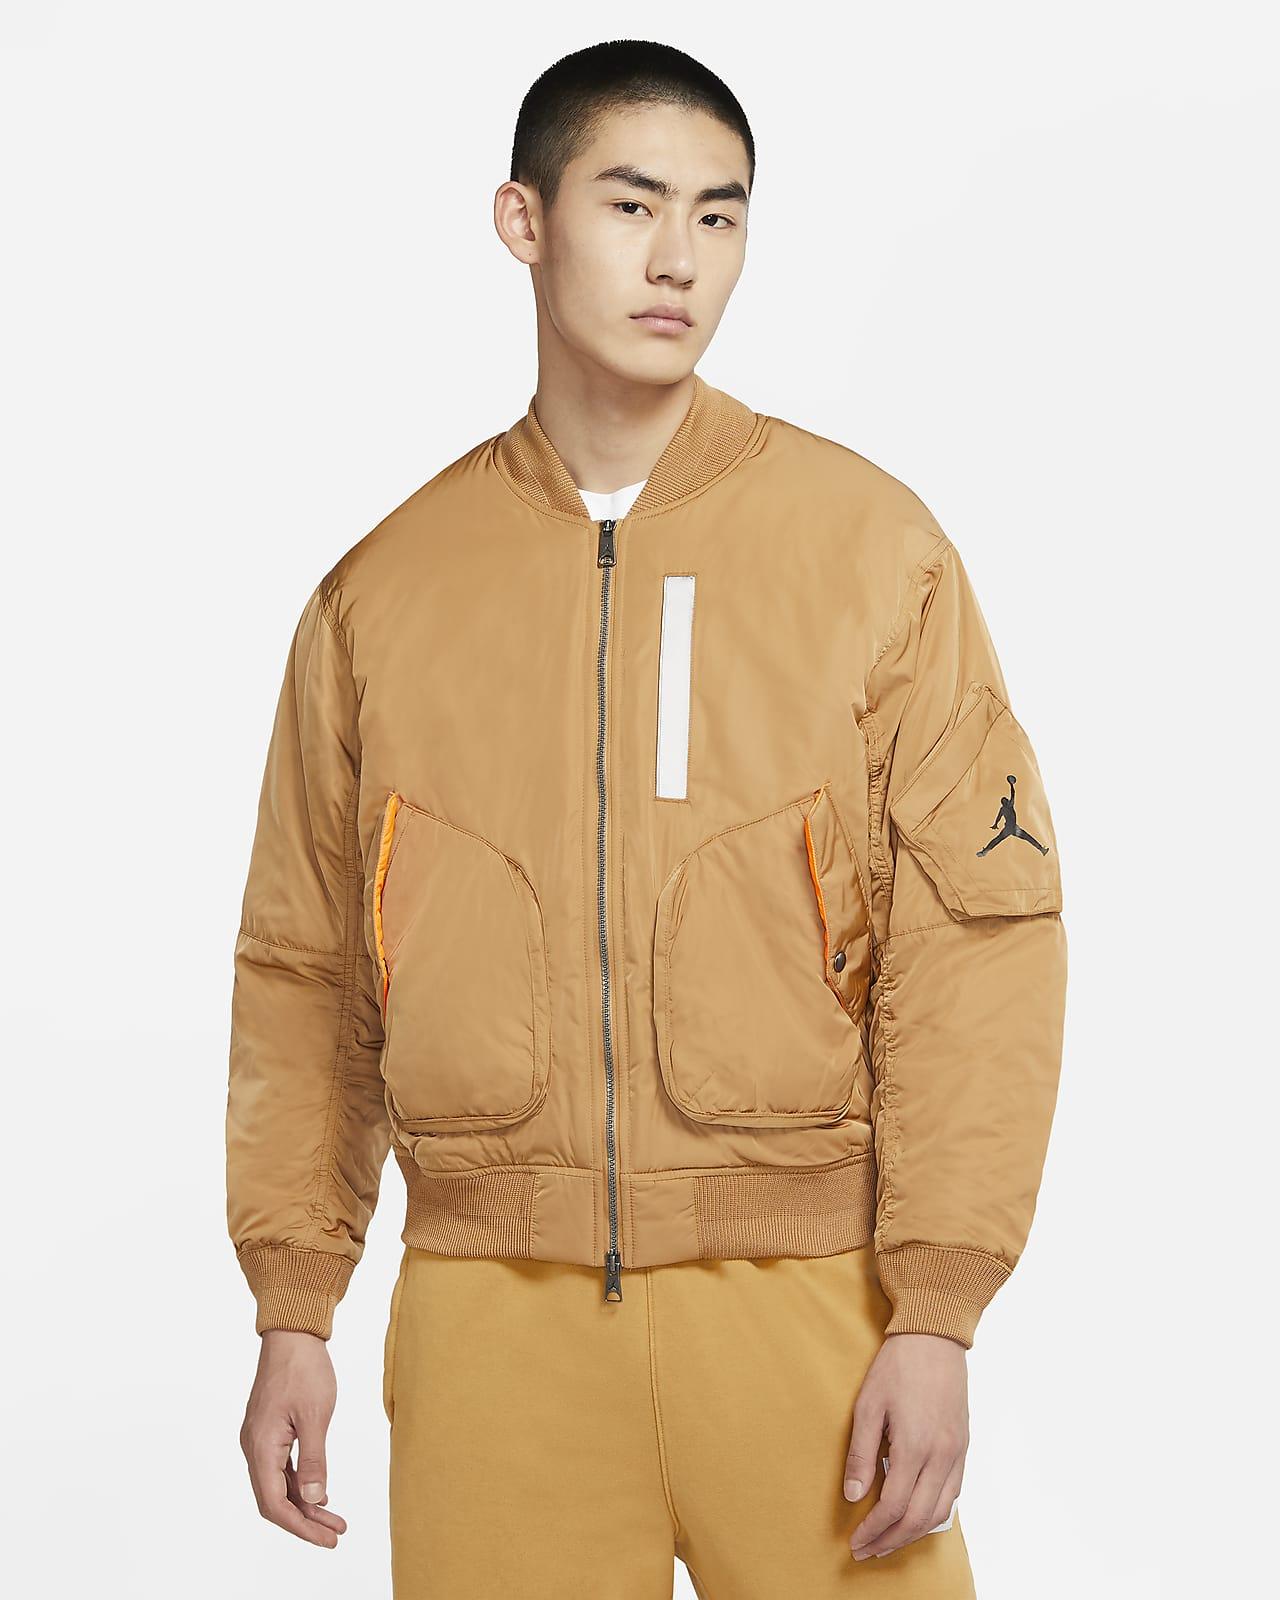 Jordan MA-1 Flight 男子夹克